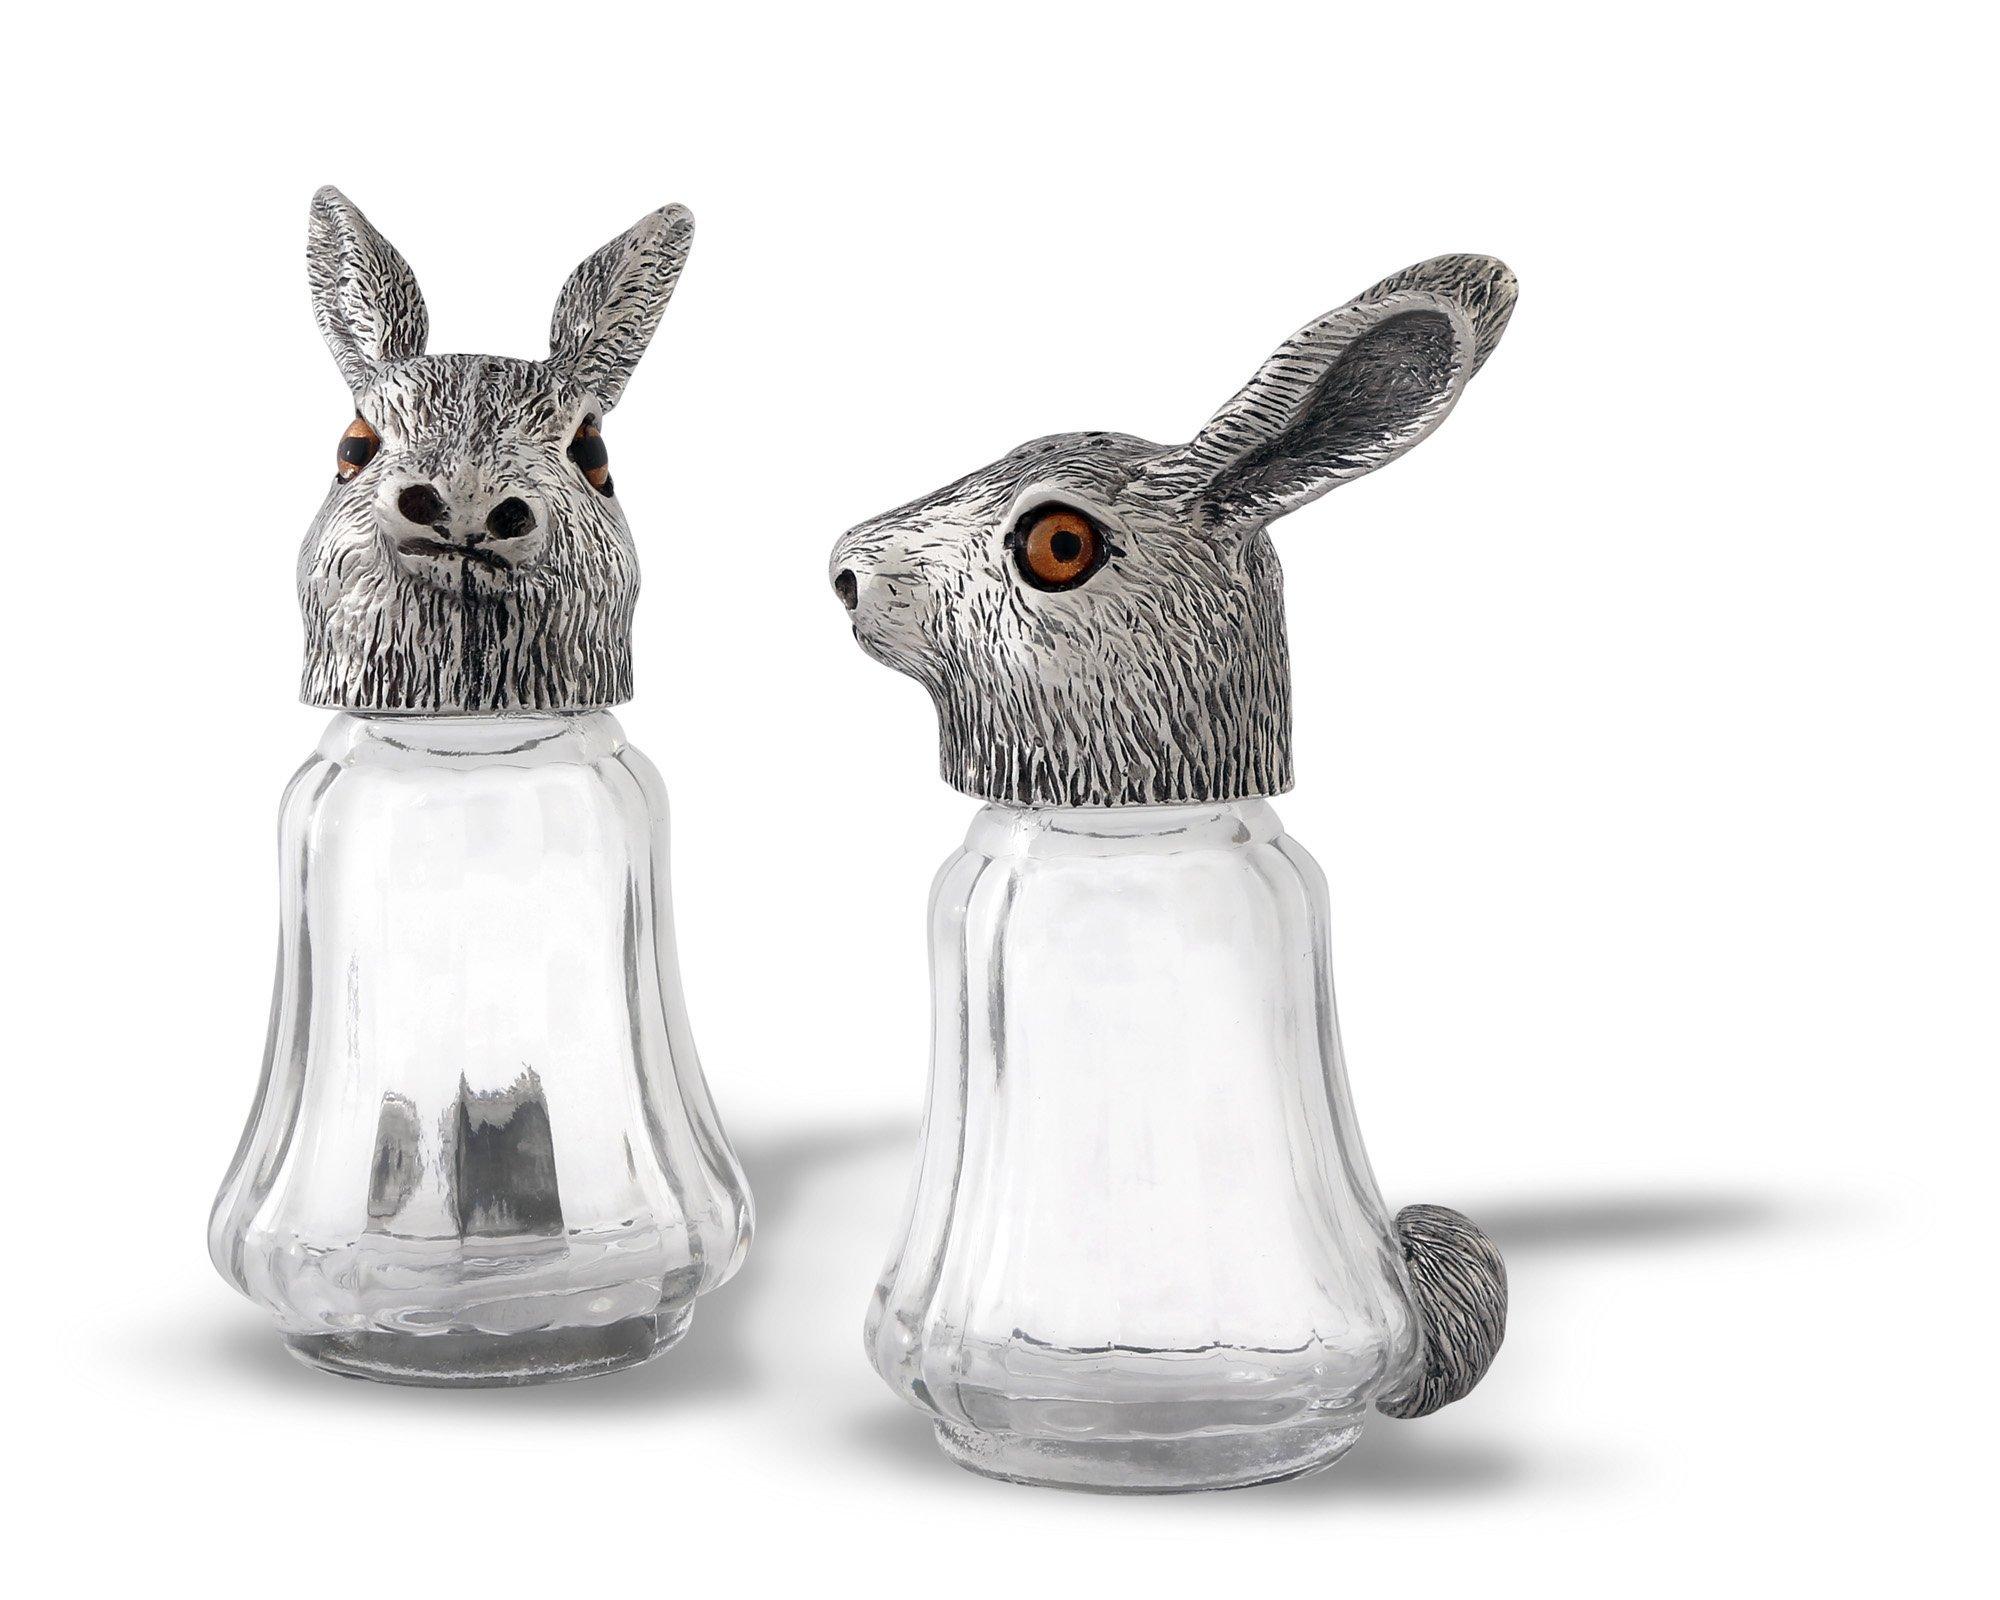 Vagabond House Glass Rabbit Salt & Pepper Set 4.5'' Tall